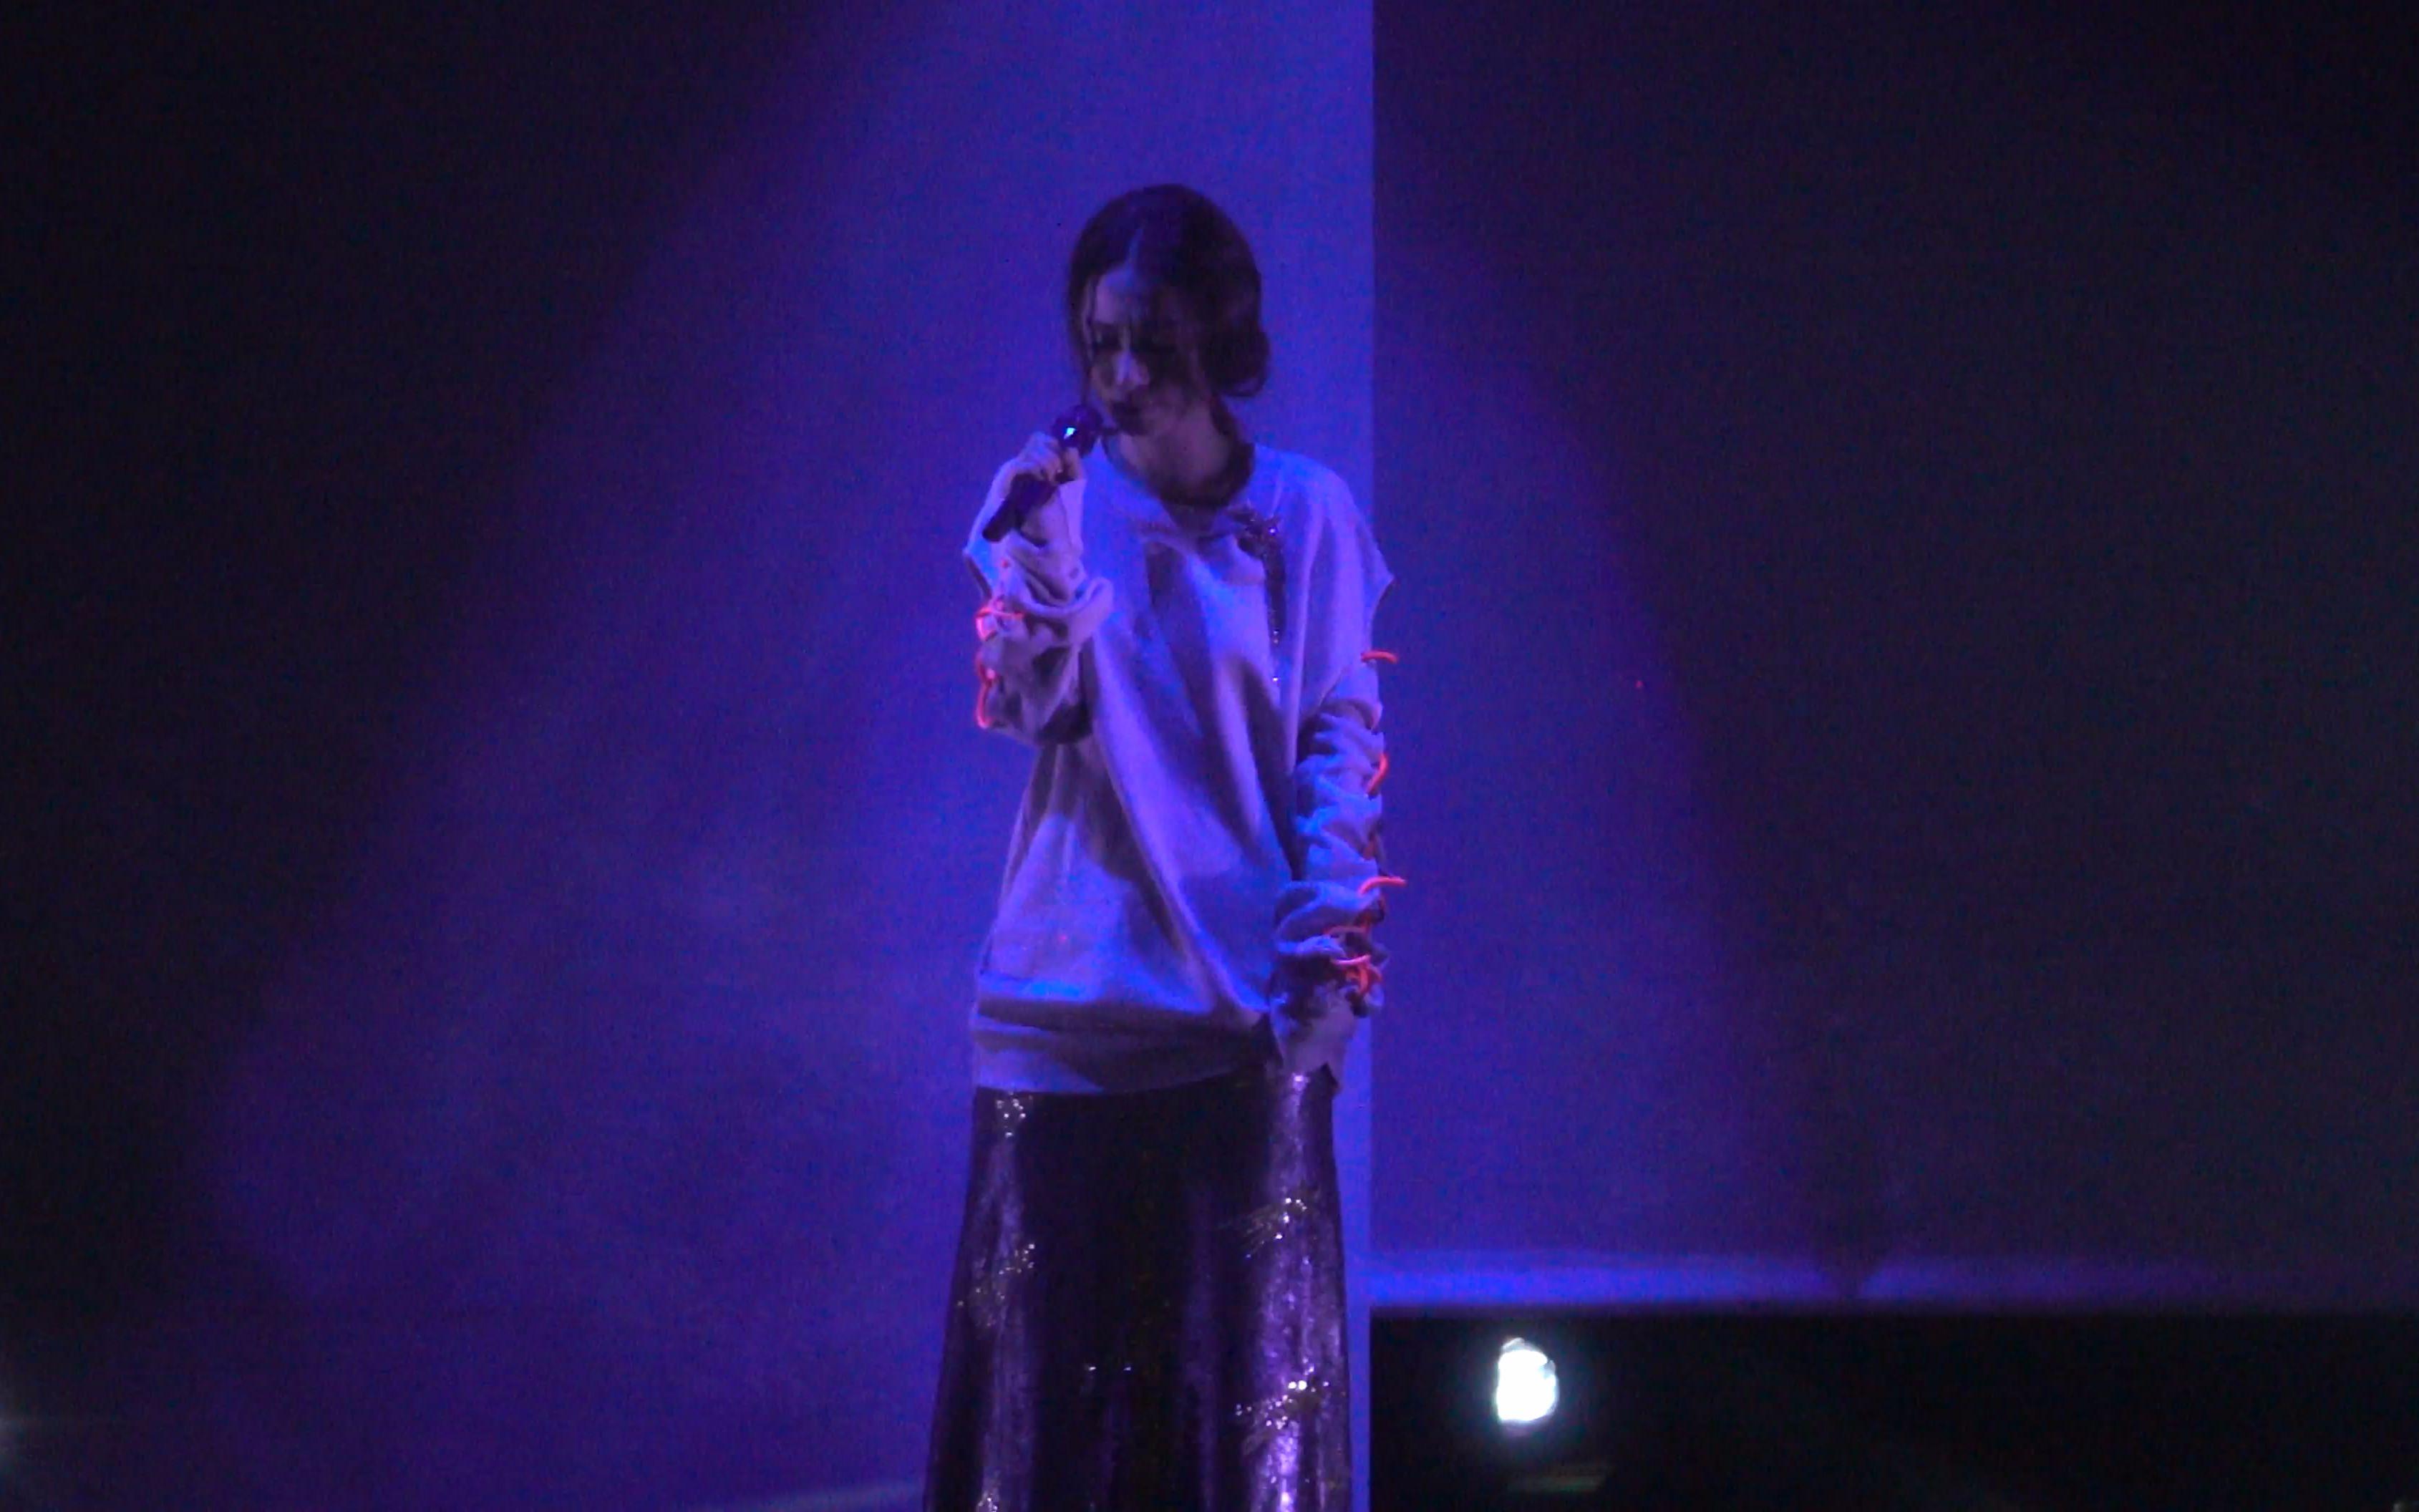 【HEBE田馥甄】演員-如果IF巡回演唱會PLUS 2017 長沙站_嗶哩嗶哩 (゜-゜)つロ 干杯~-bilibili